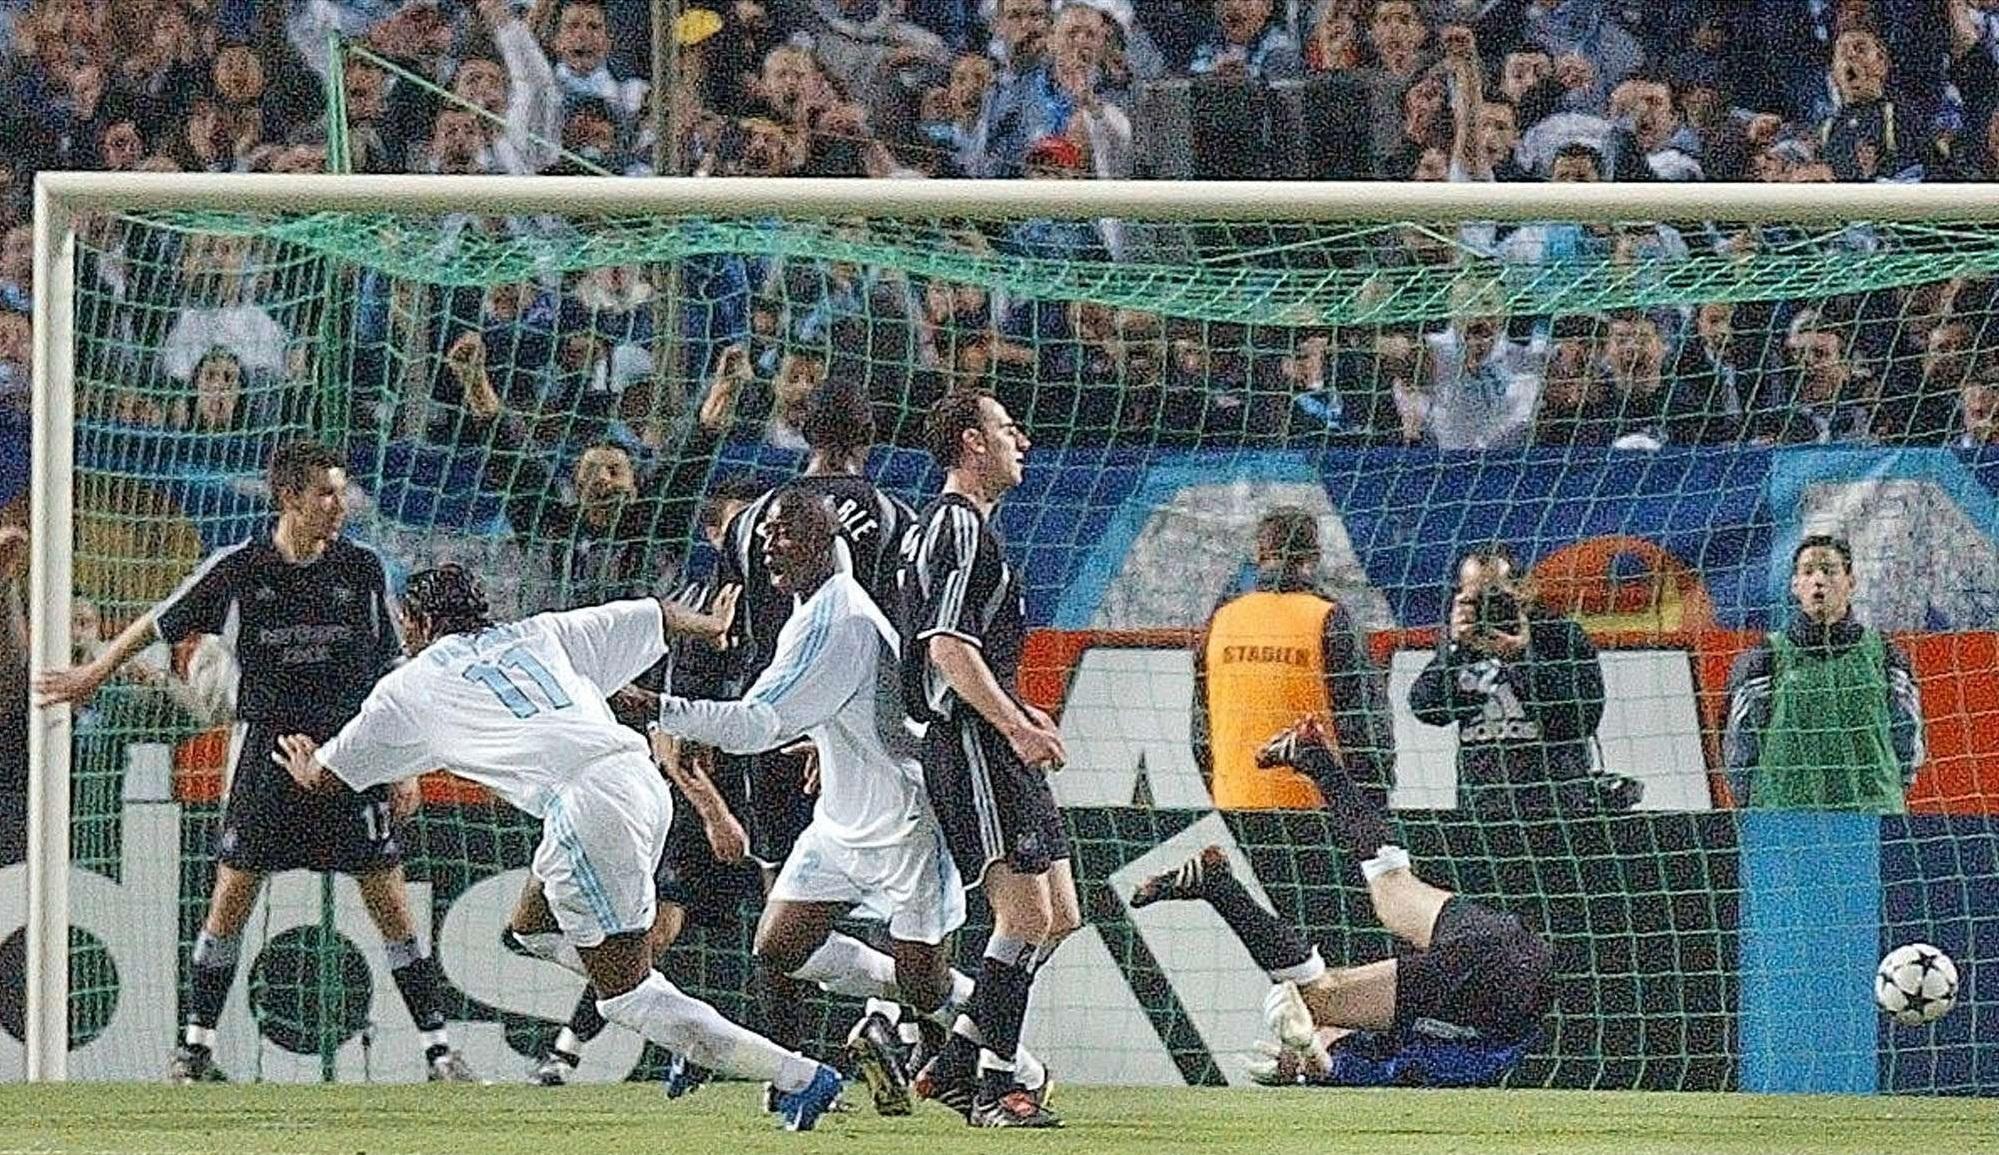 Le Marseillais Didier Drogba, à gauche, lors du match contre Newcastle United, au stade Vélodrome de Marseille, jeudi 6 mai 2004.